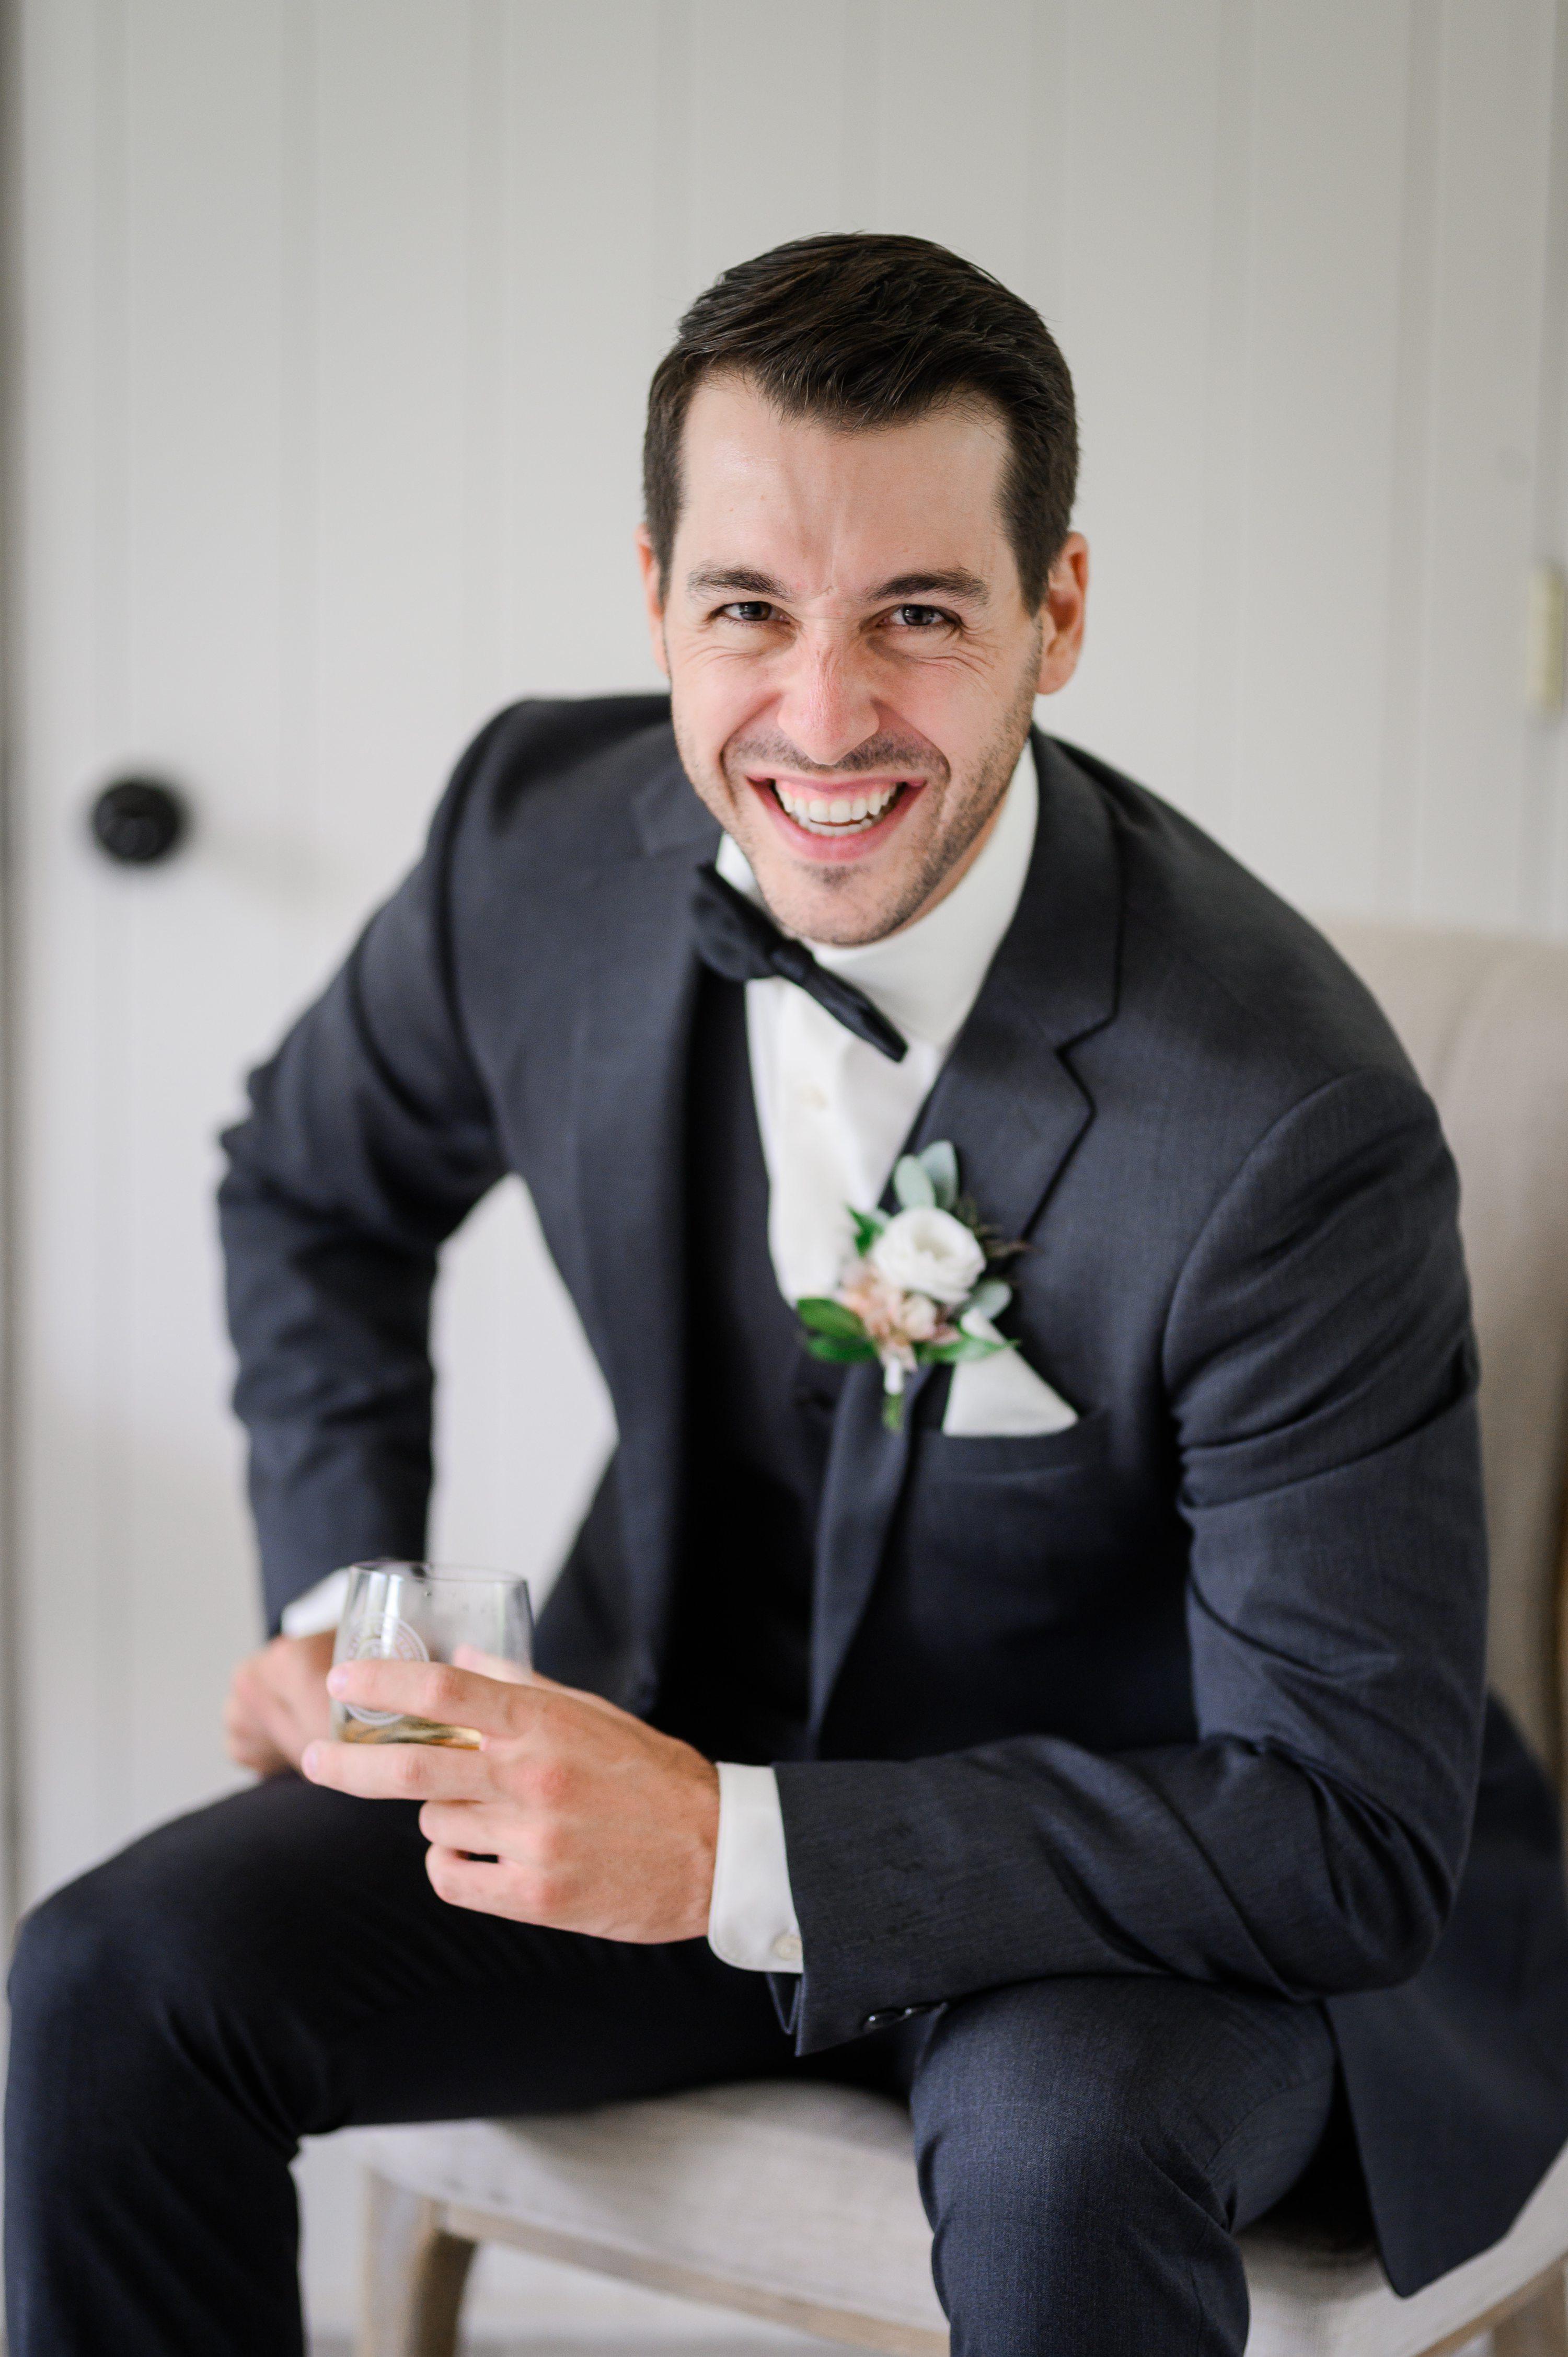 Photographe de mariage,wedding vendors